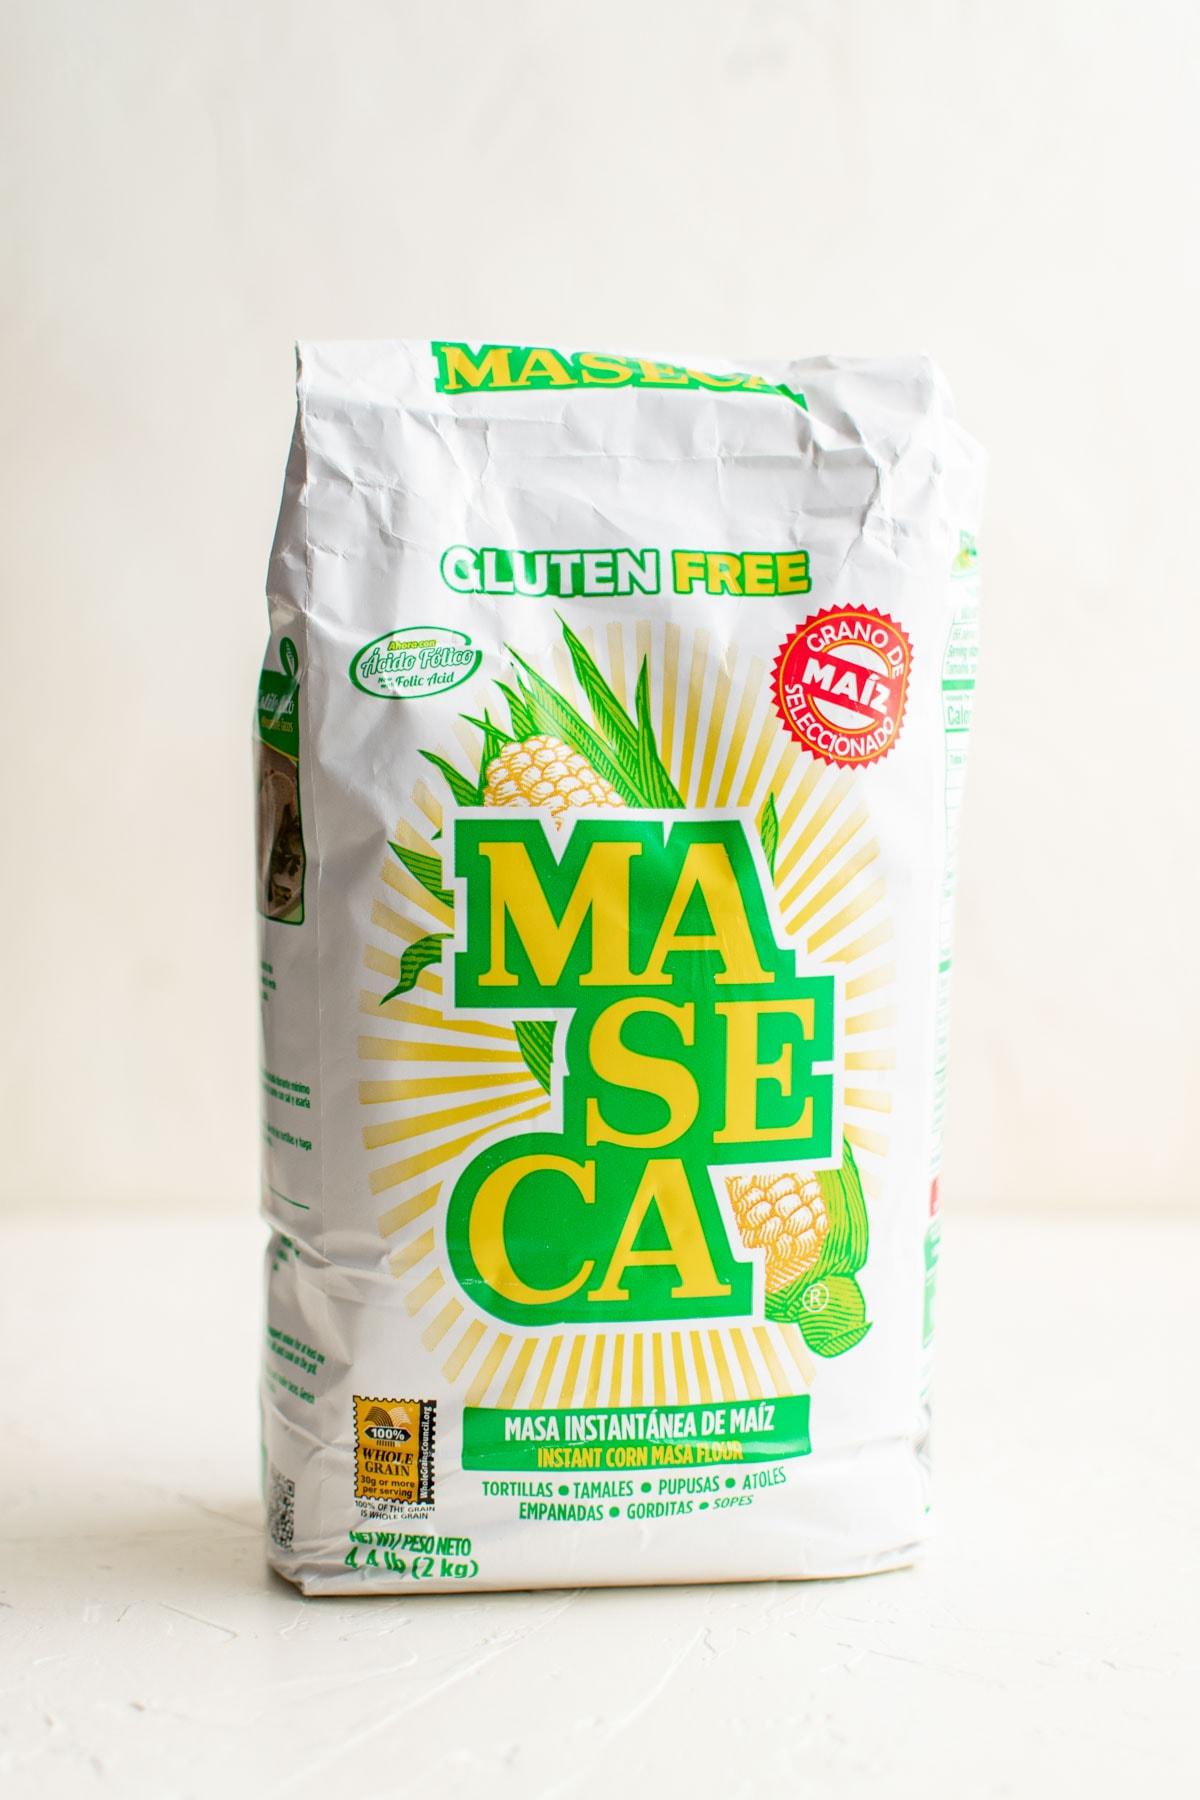 bag of maseca brand corn flour